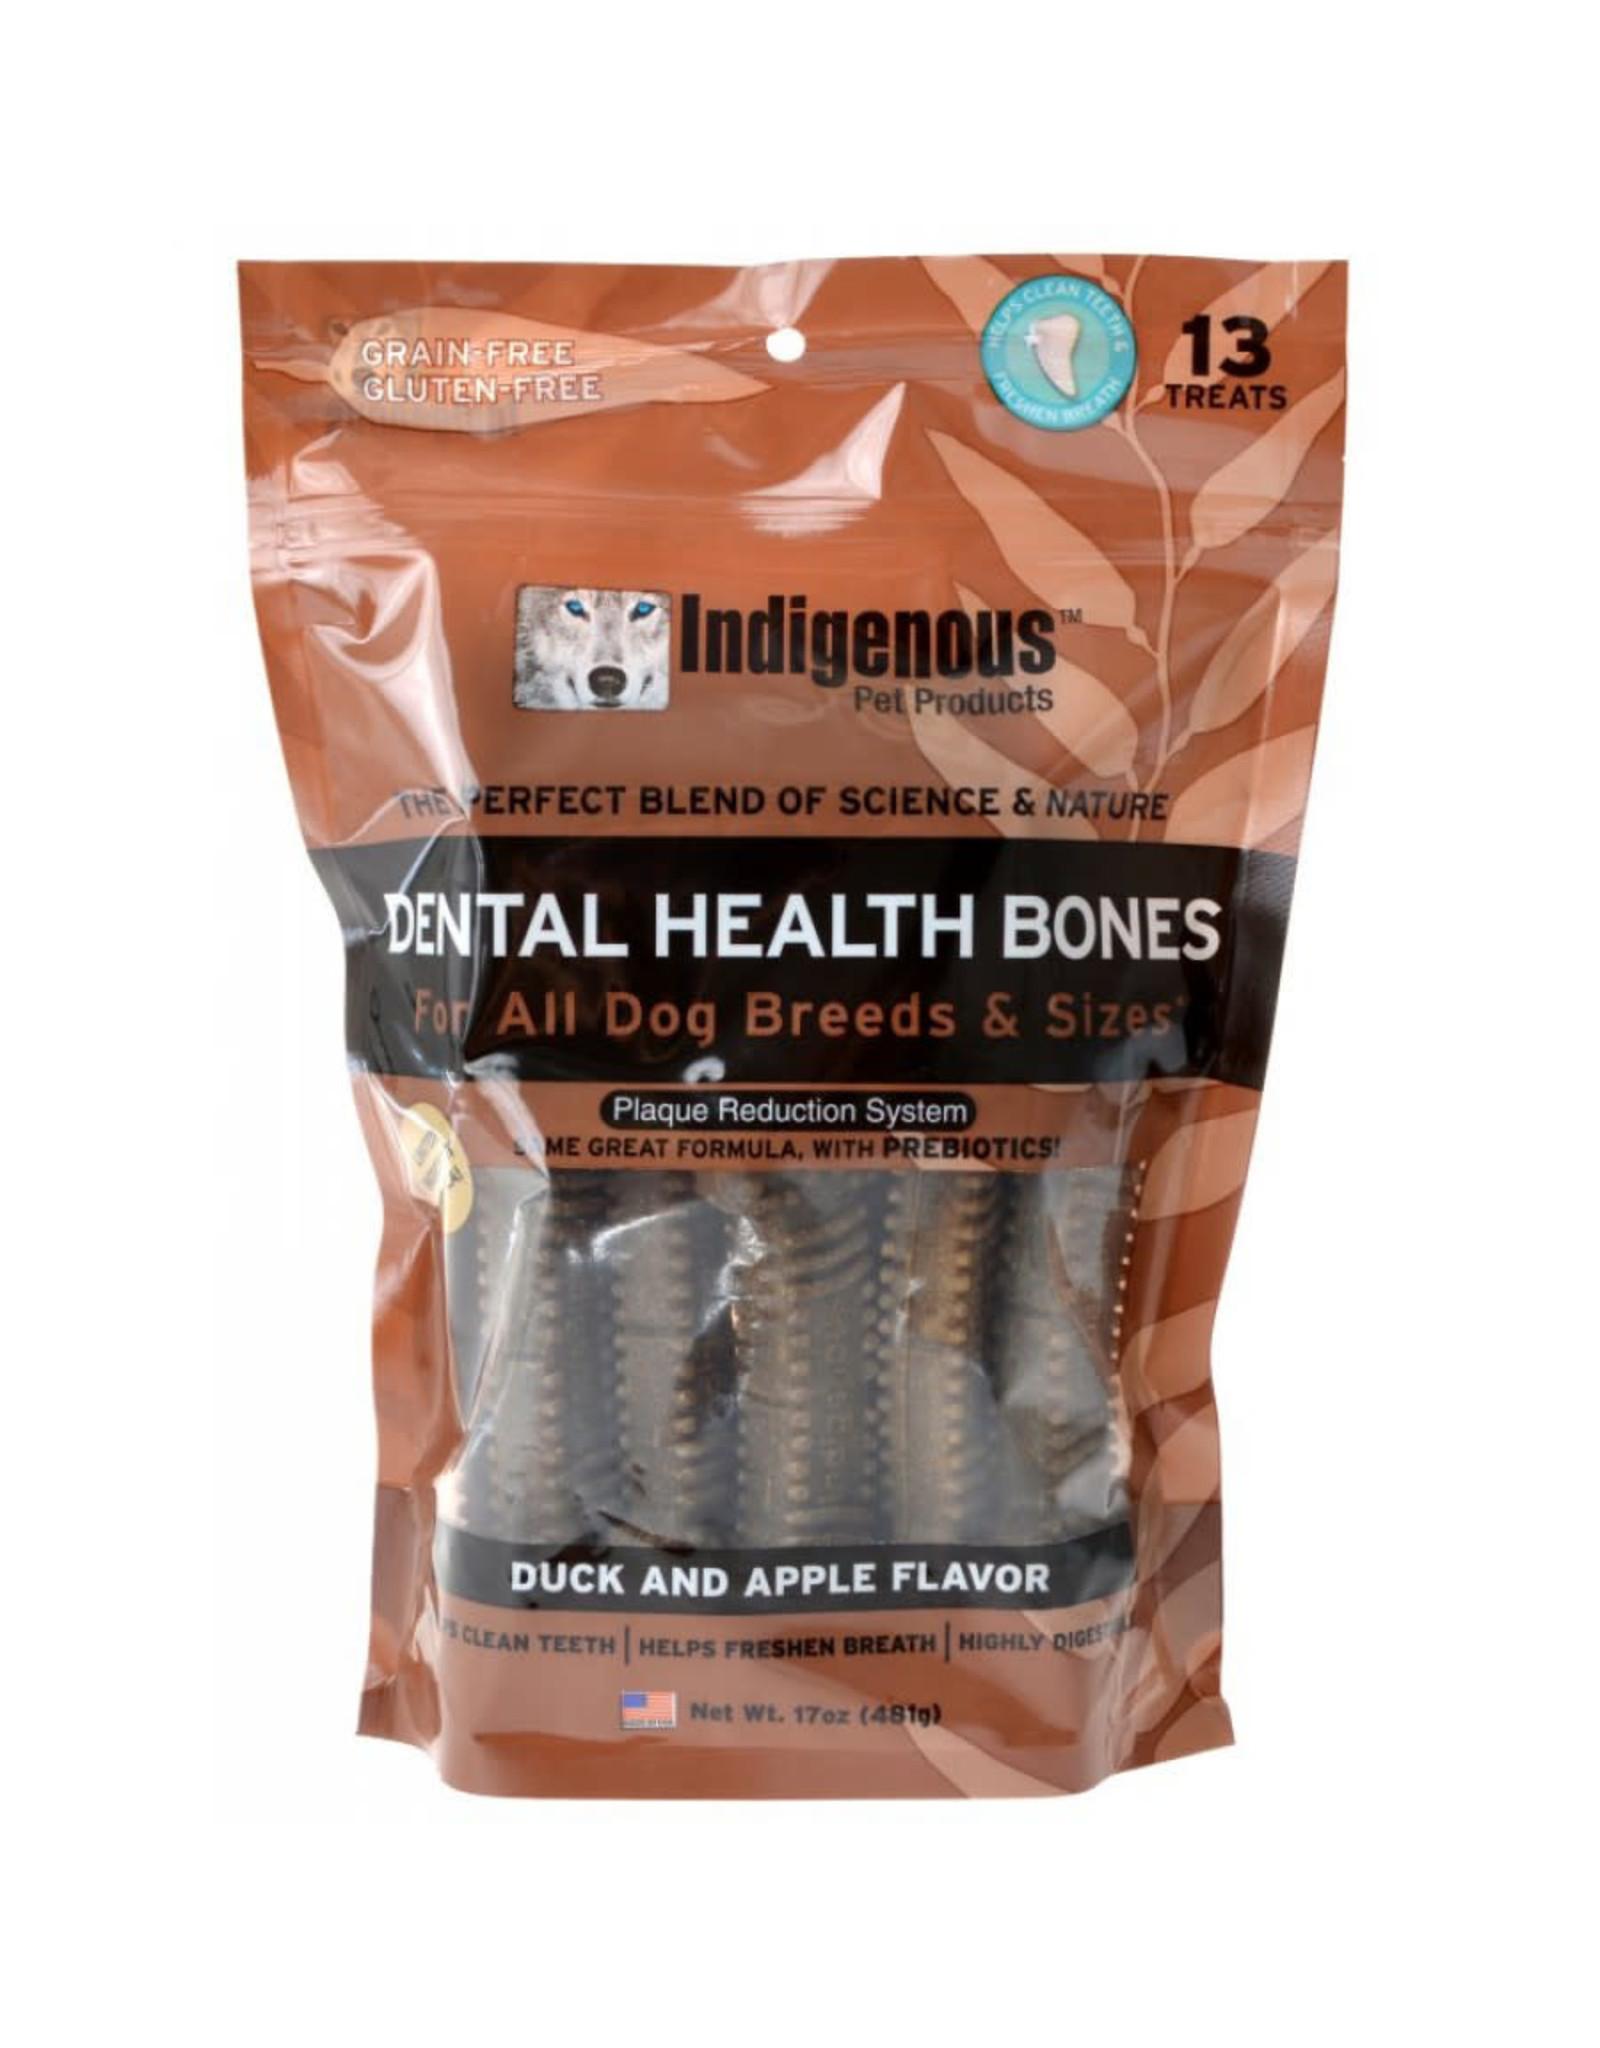 Indigenous Pet Products INDIGENOUS DENTAL HEALTH BONES DUCK & APPLE FLAVOR 13-COUNT